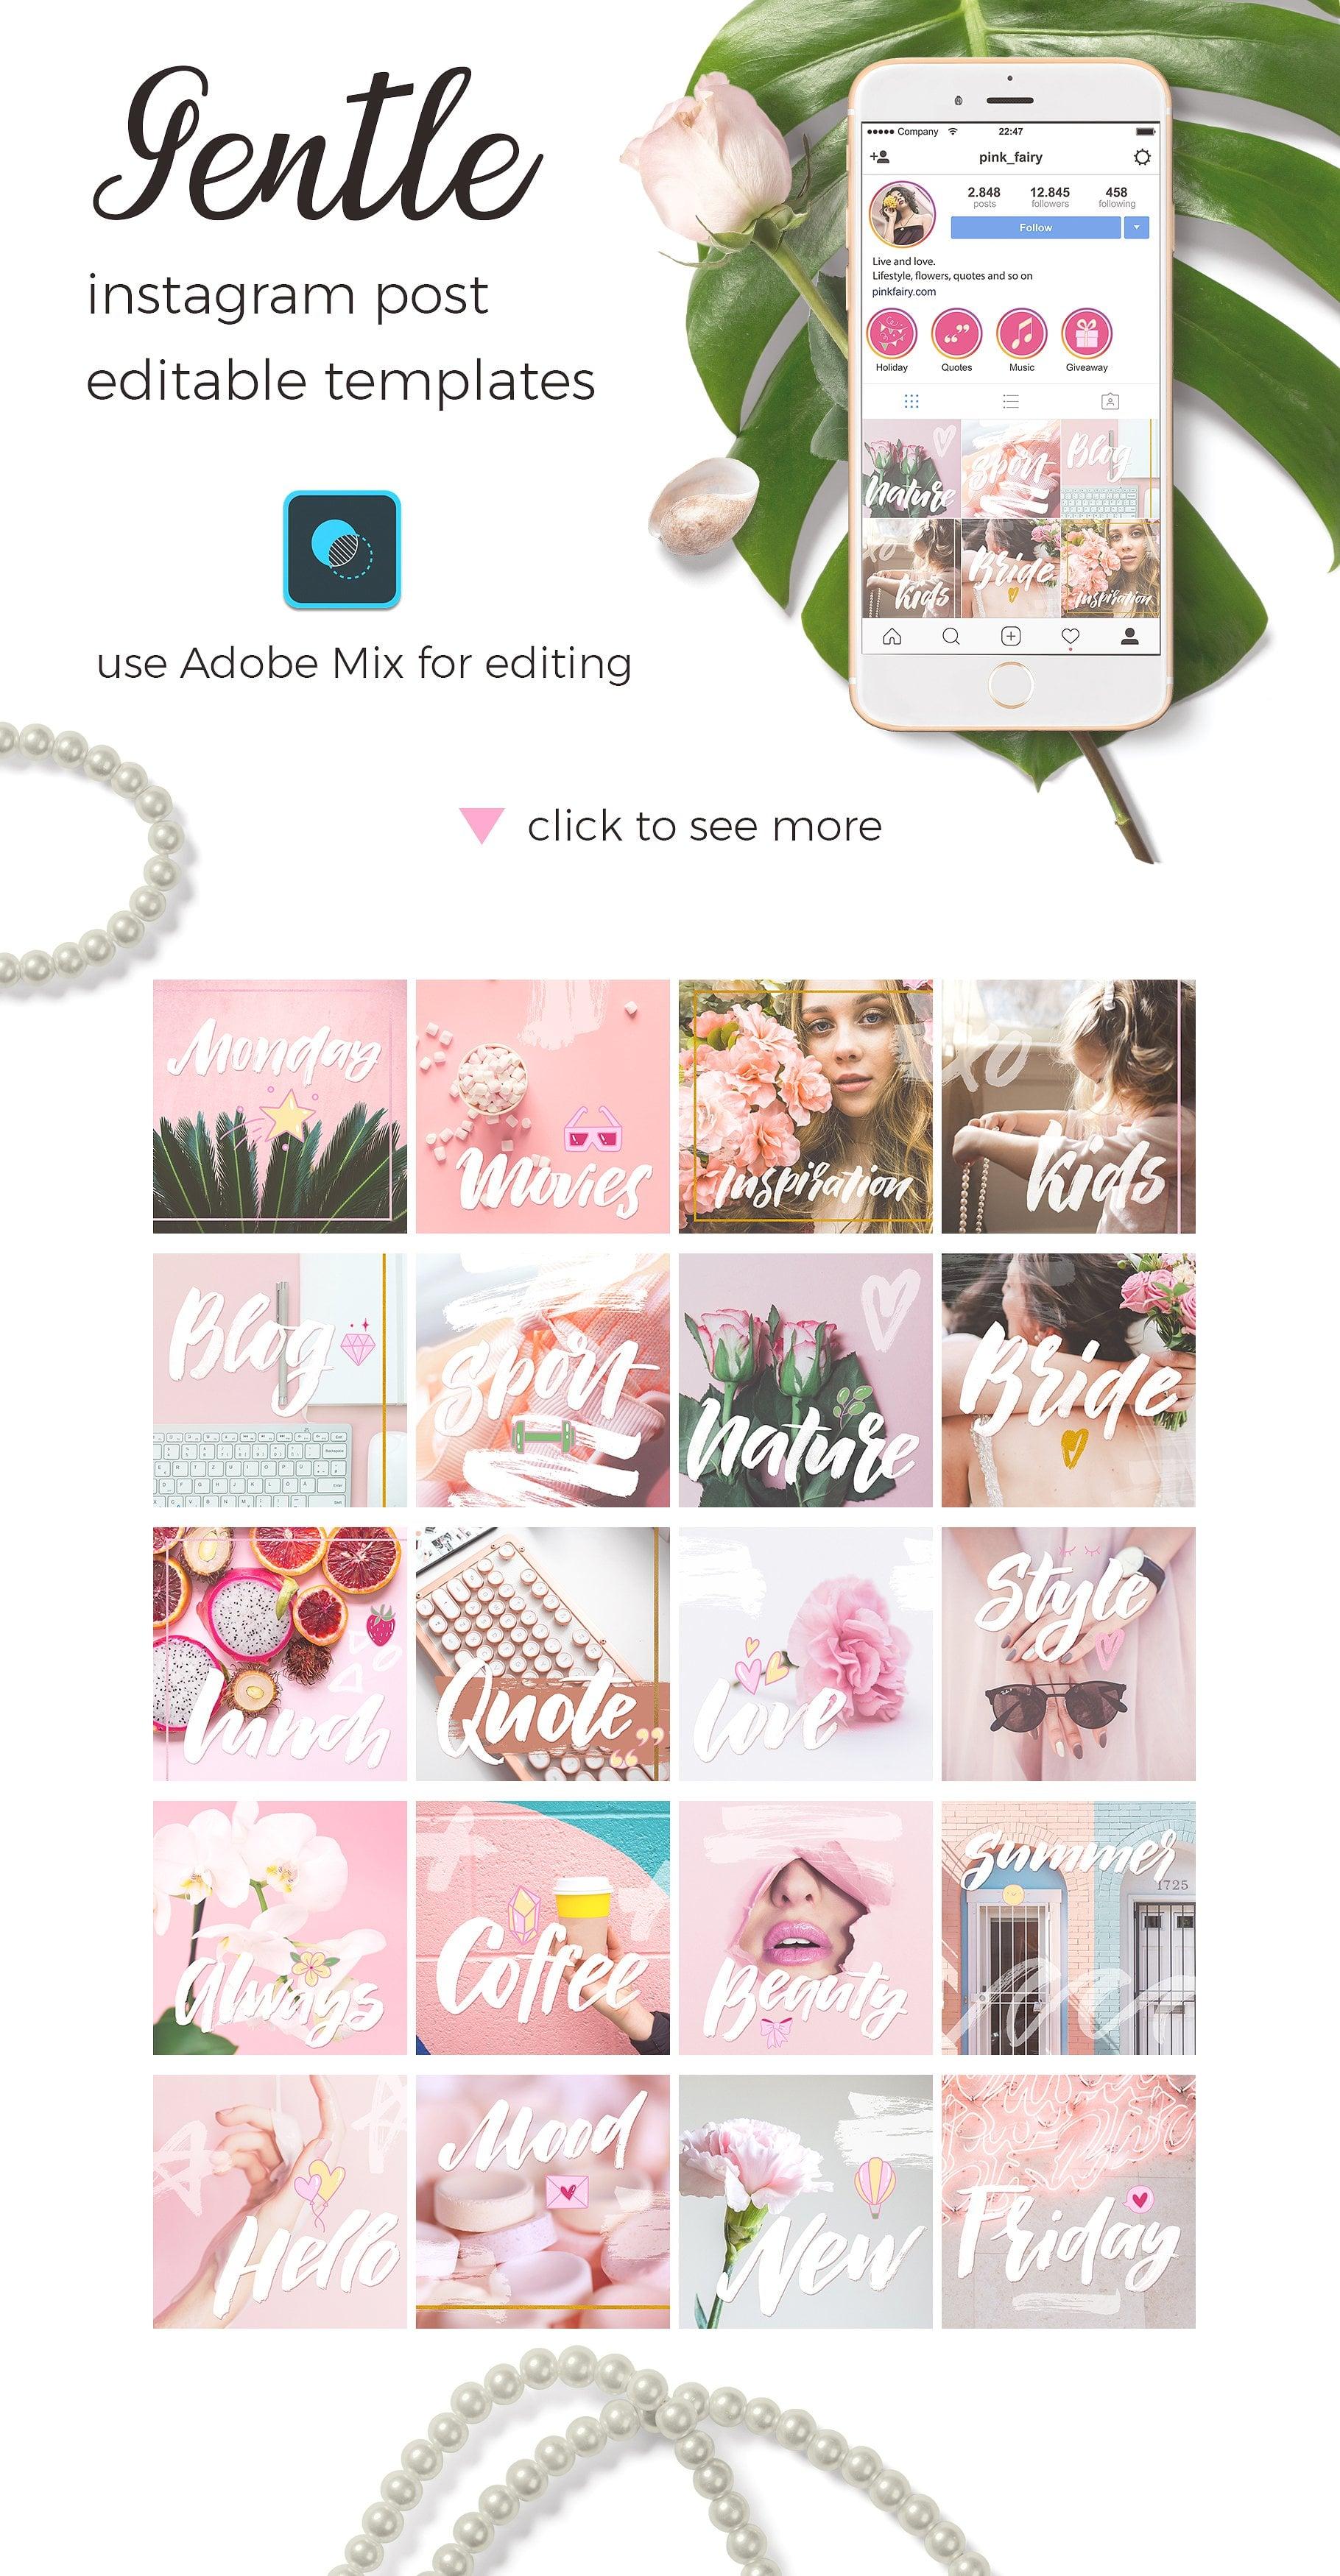 Insta Lady: Instagram Highlight Icons & Posts - $22 - prev6